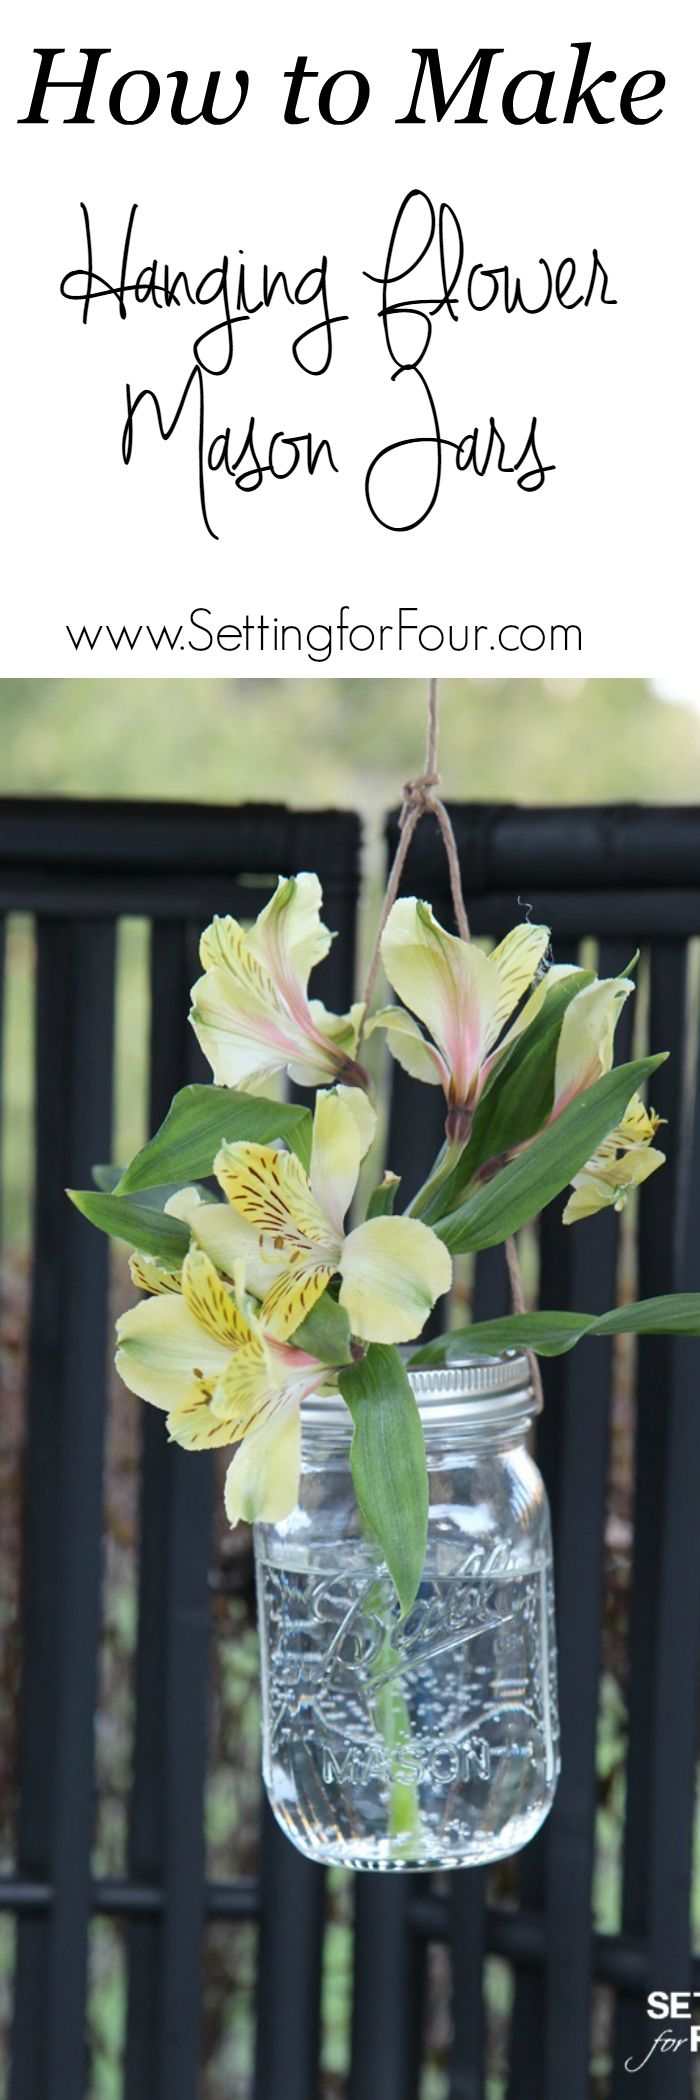 Outdoor Hanging Flower Mason Jars